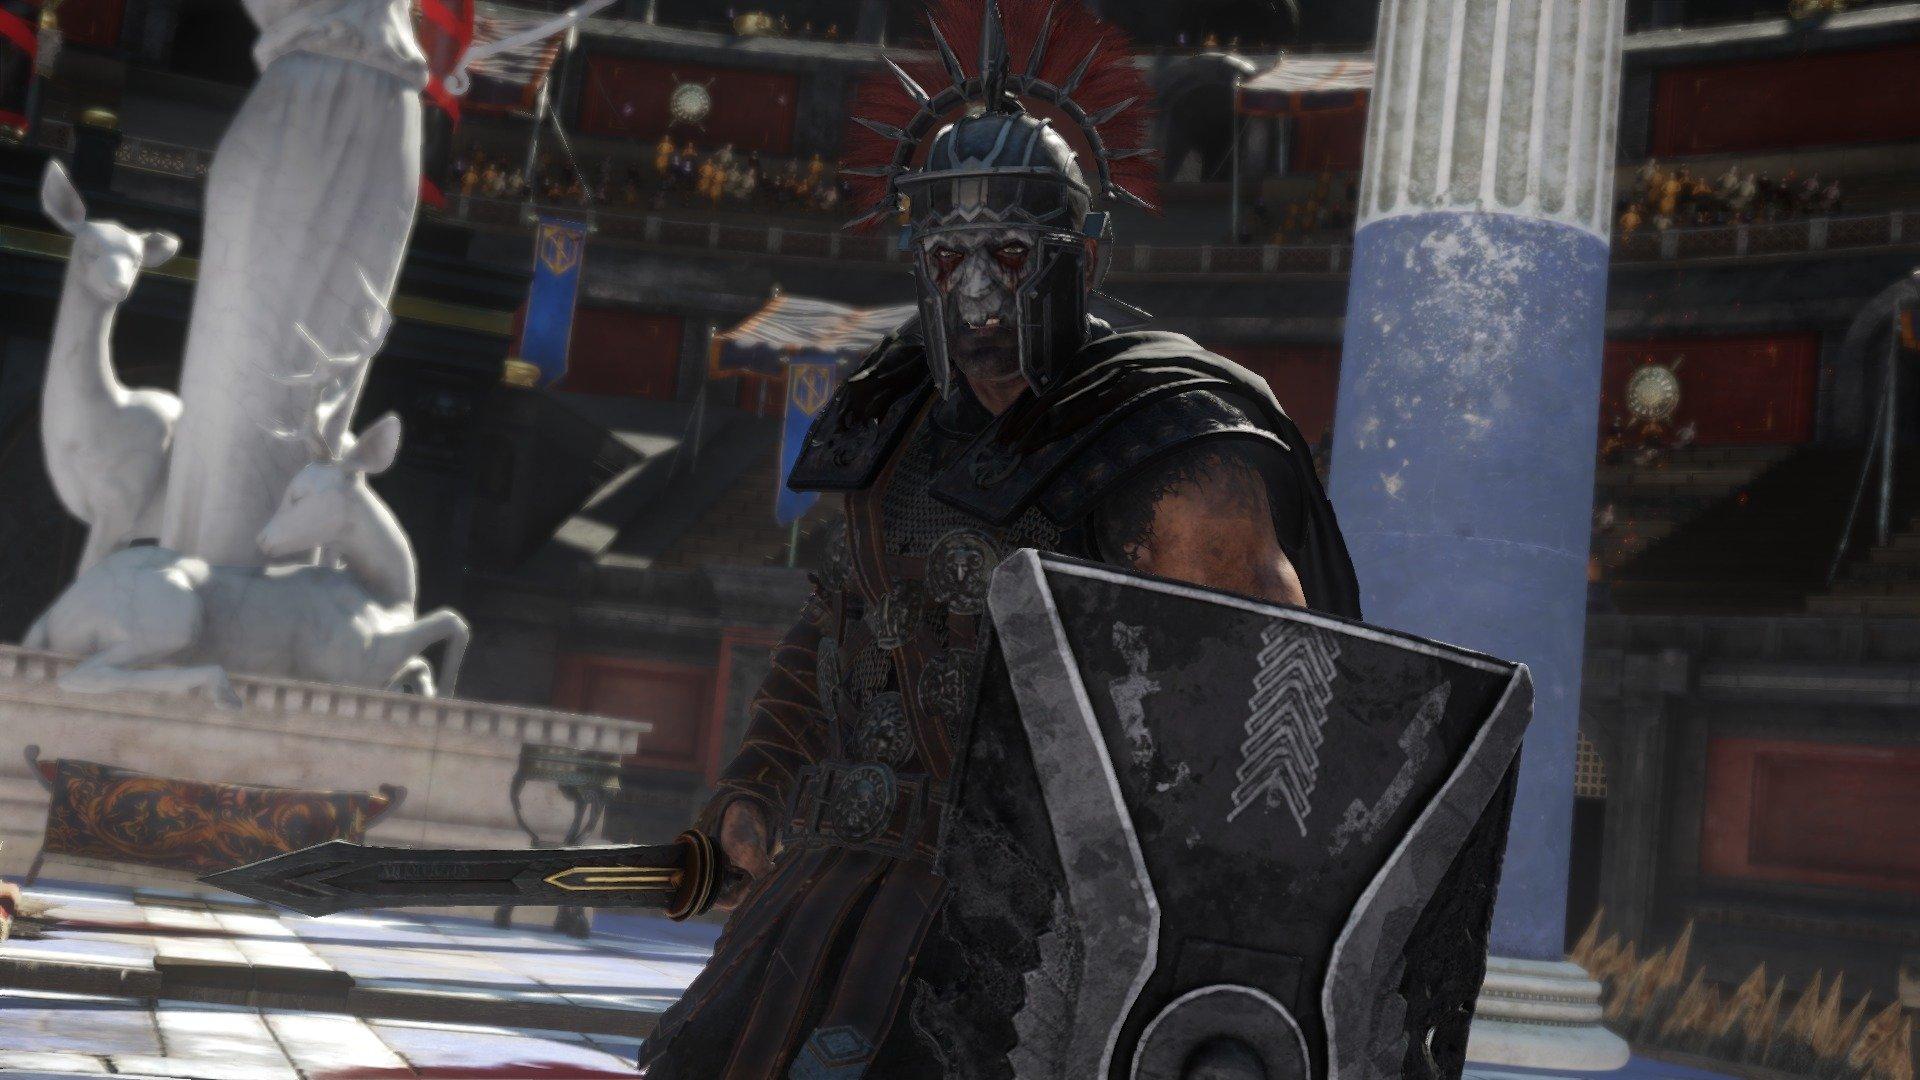 analysis in leadership style gladiator movie